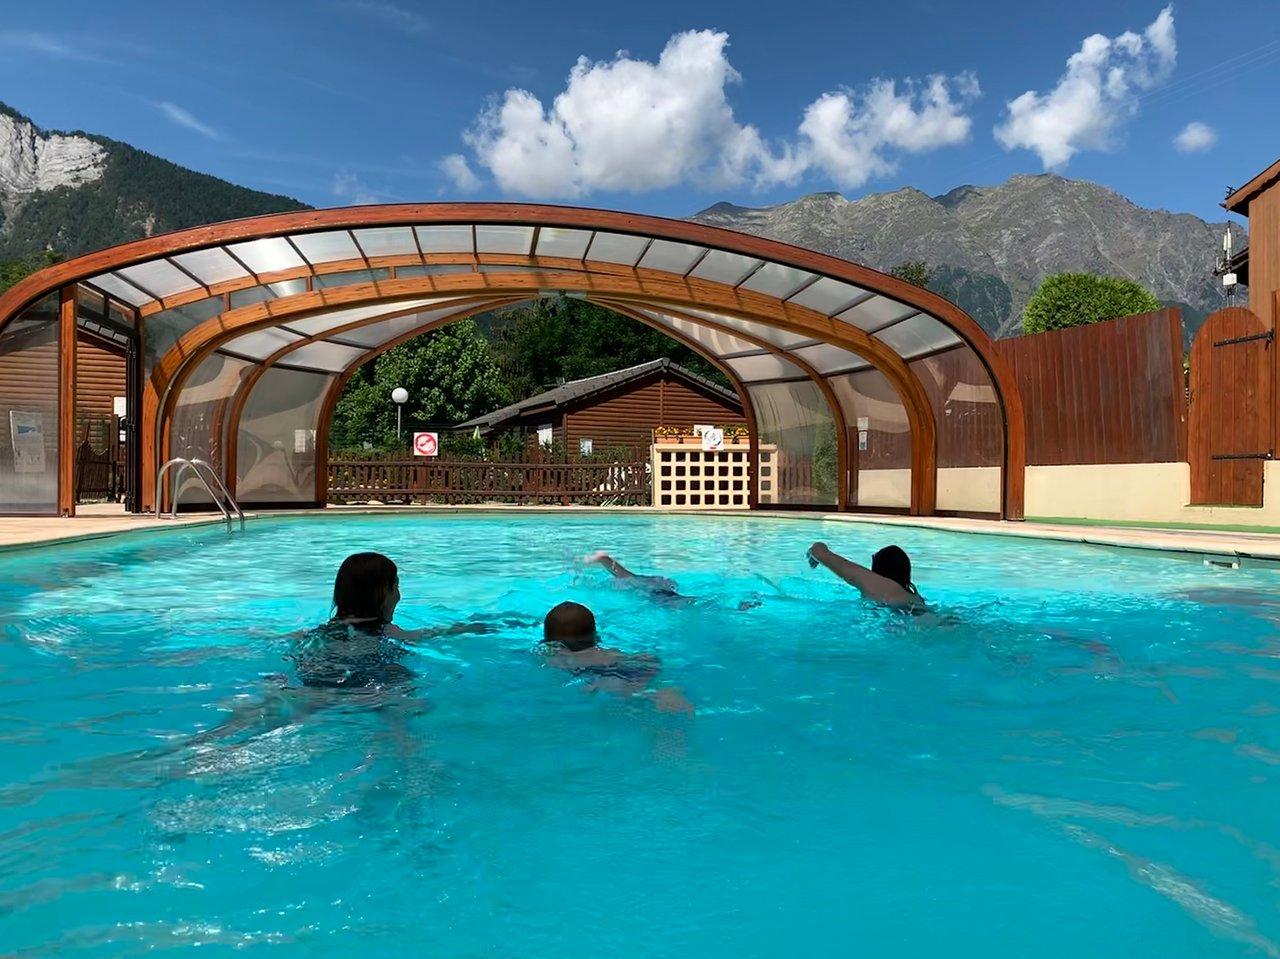 Camping A La Rencontre Du Soleil - Prices & Campground ... concernant Piscine Wasquehal